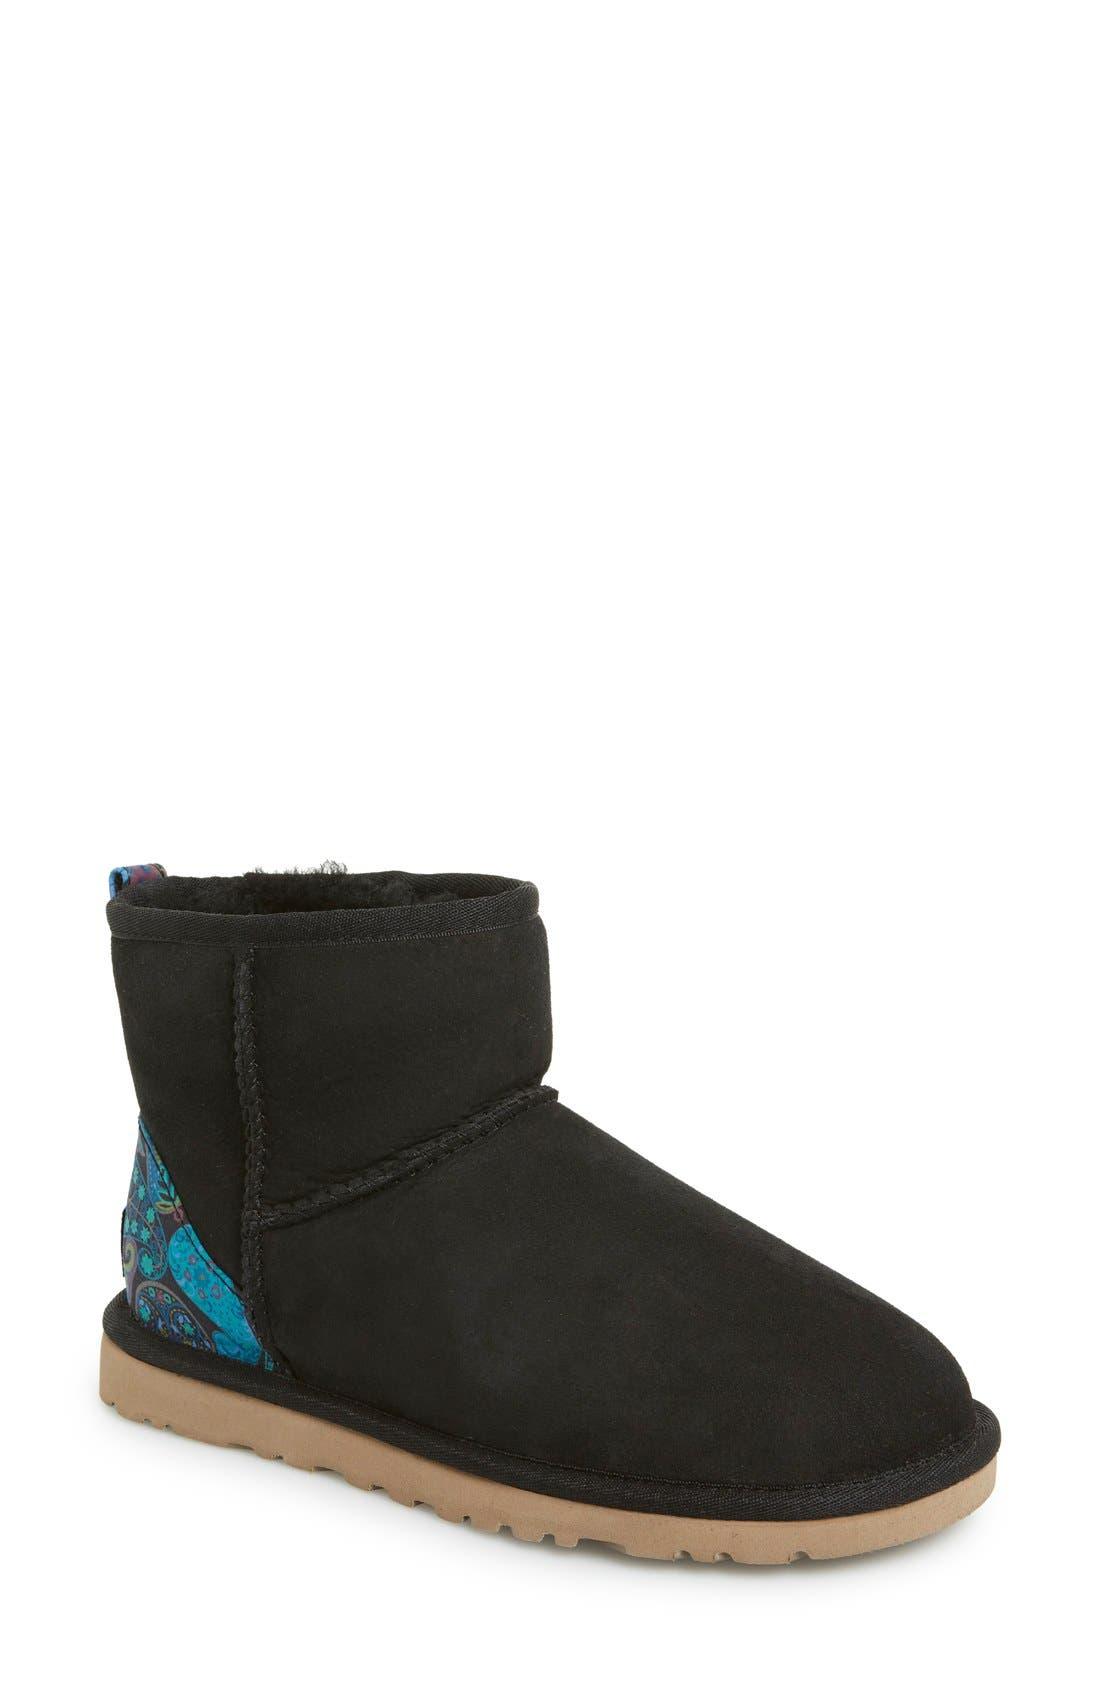 x Liberty of London 'Classic Mini' Boot, Main, color, 021